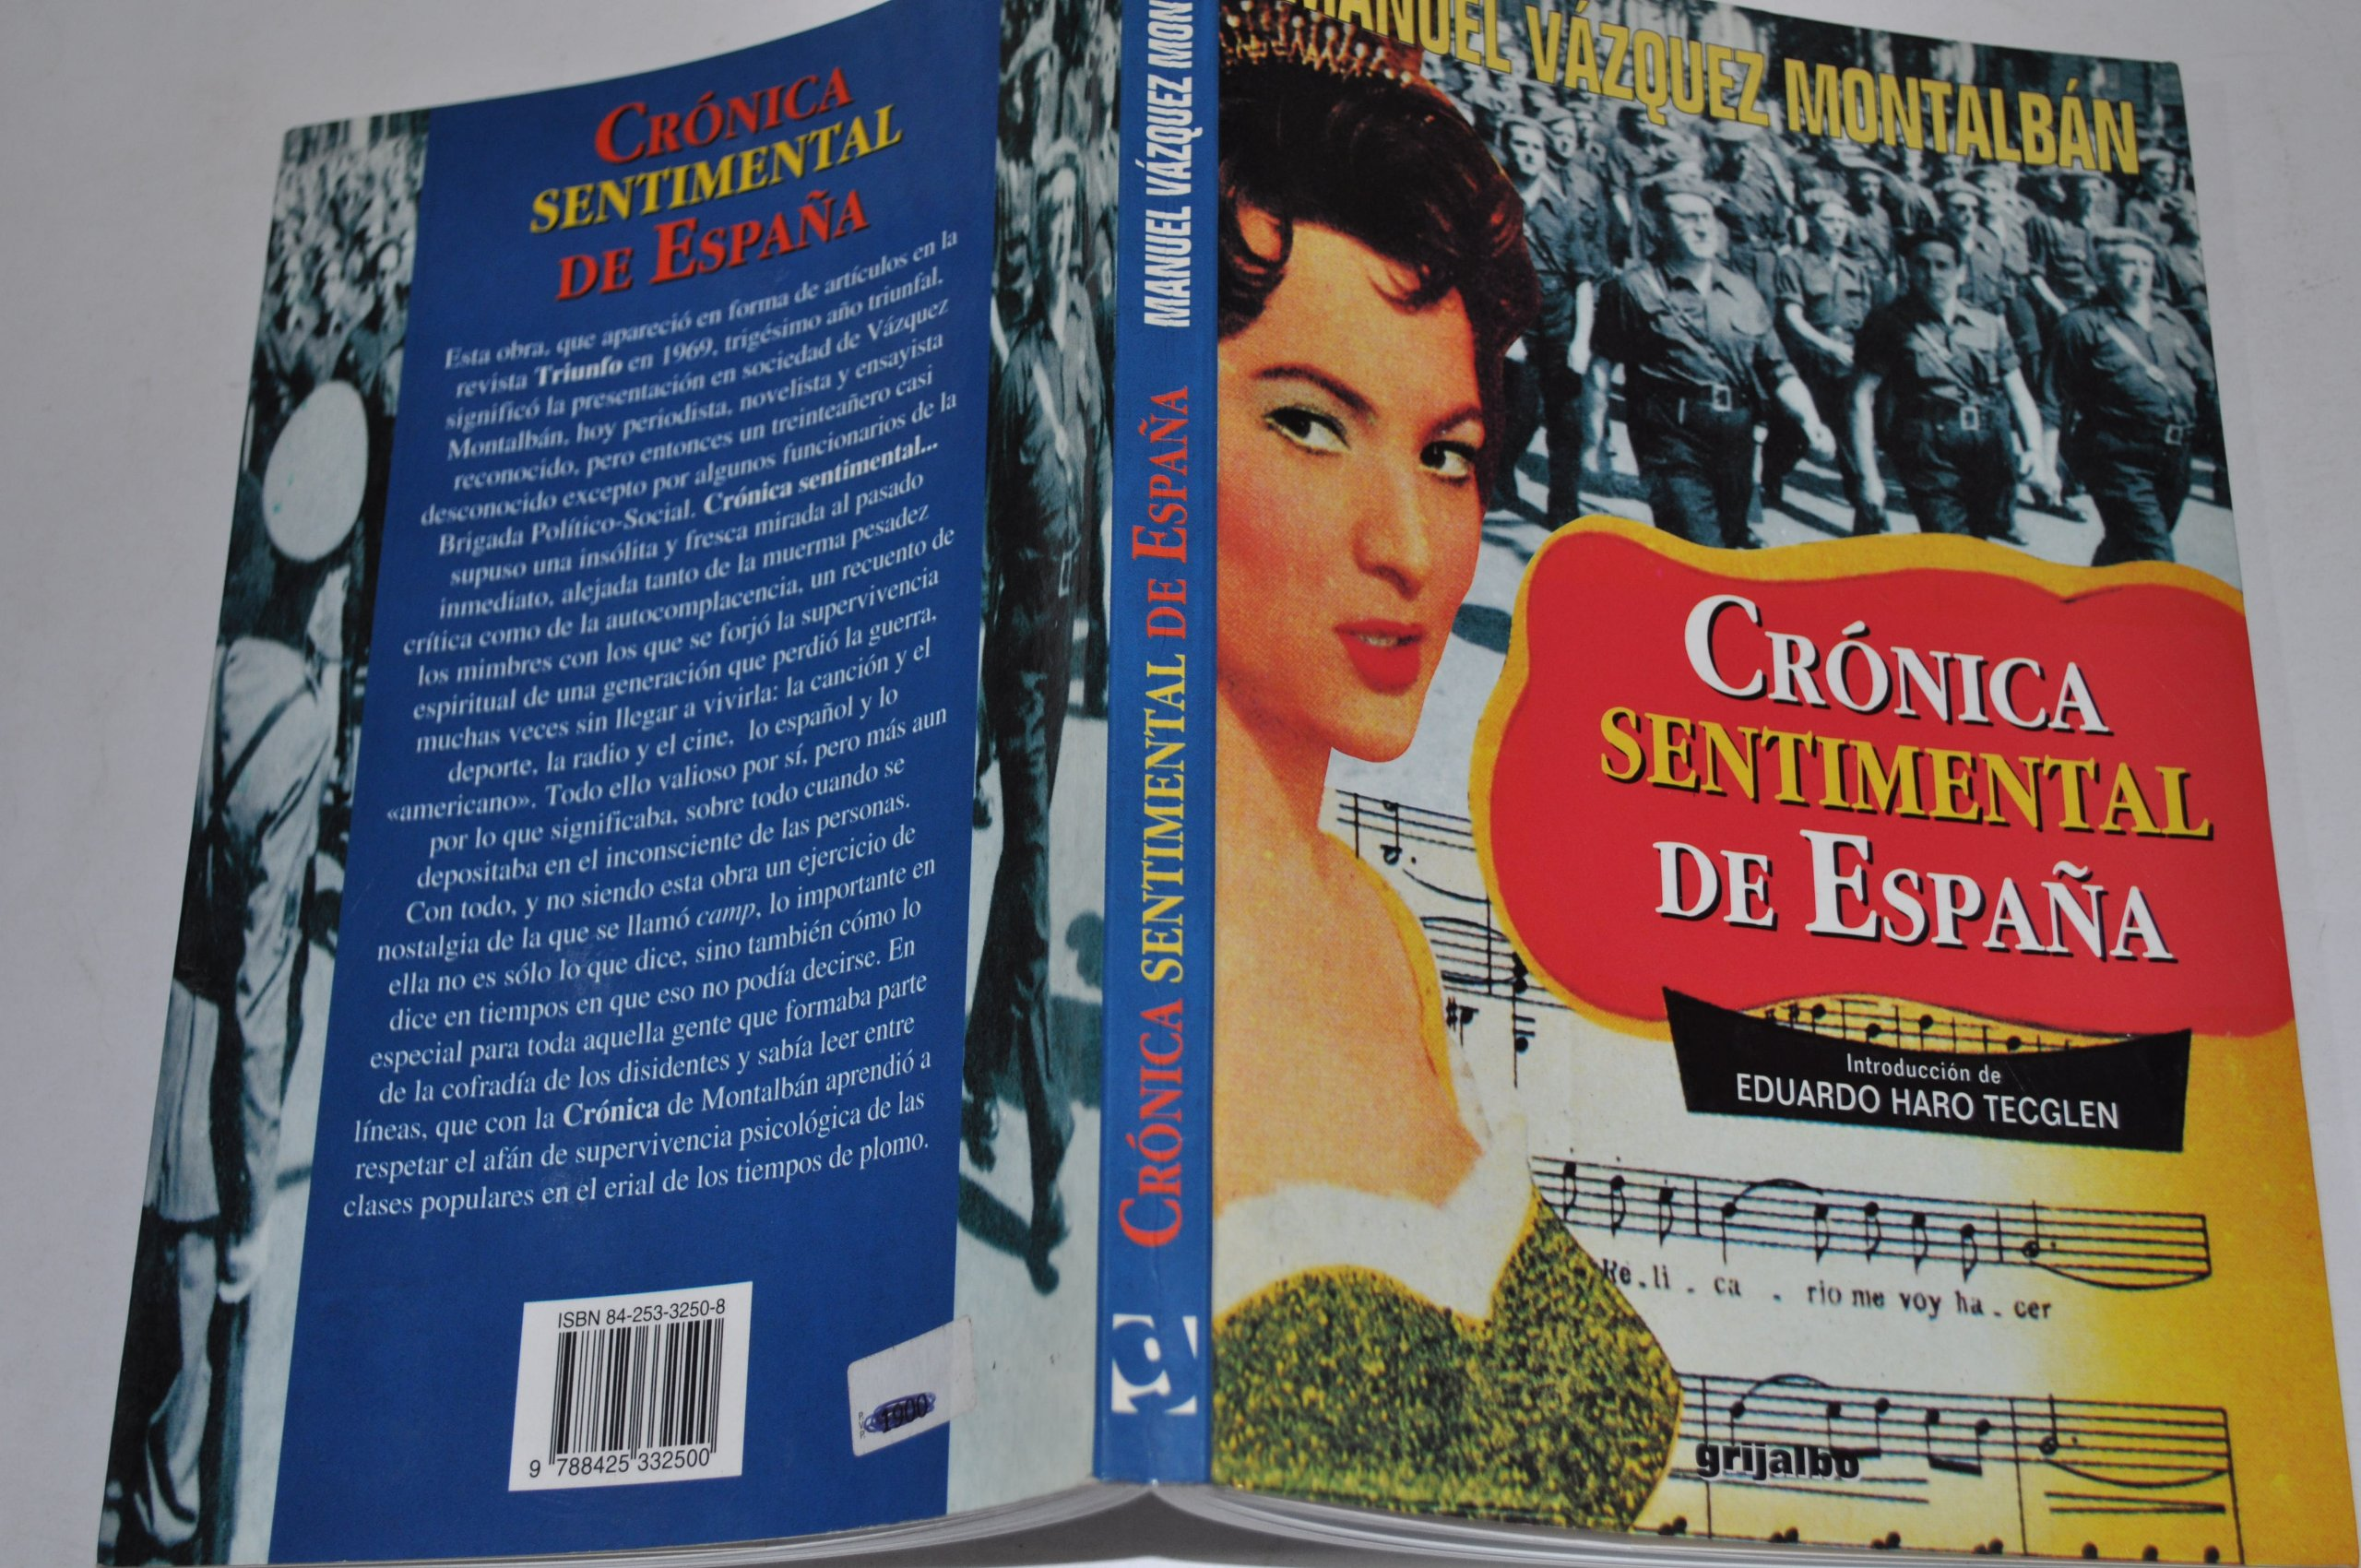 Cronica sentimental de España: Amazon.es: Manuel Vazquez Montalban: Libros